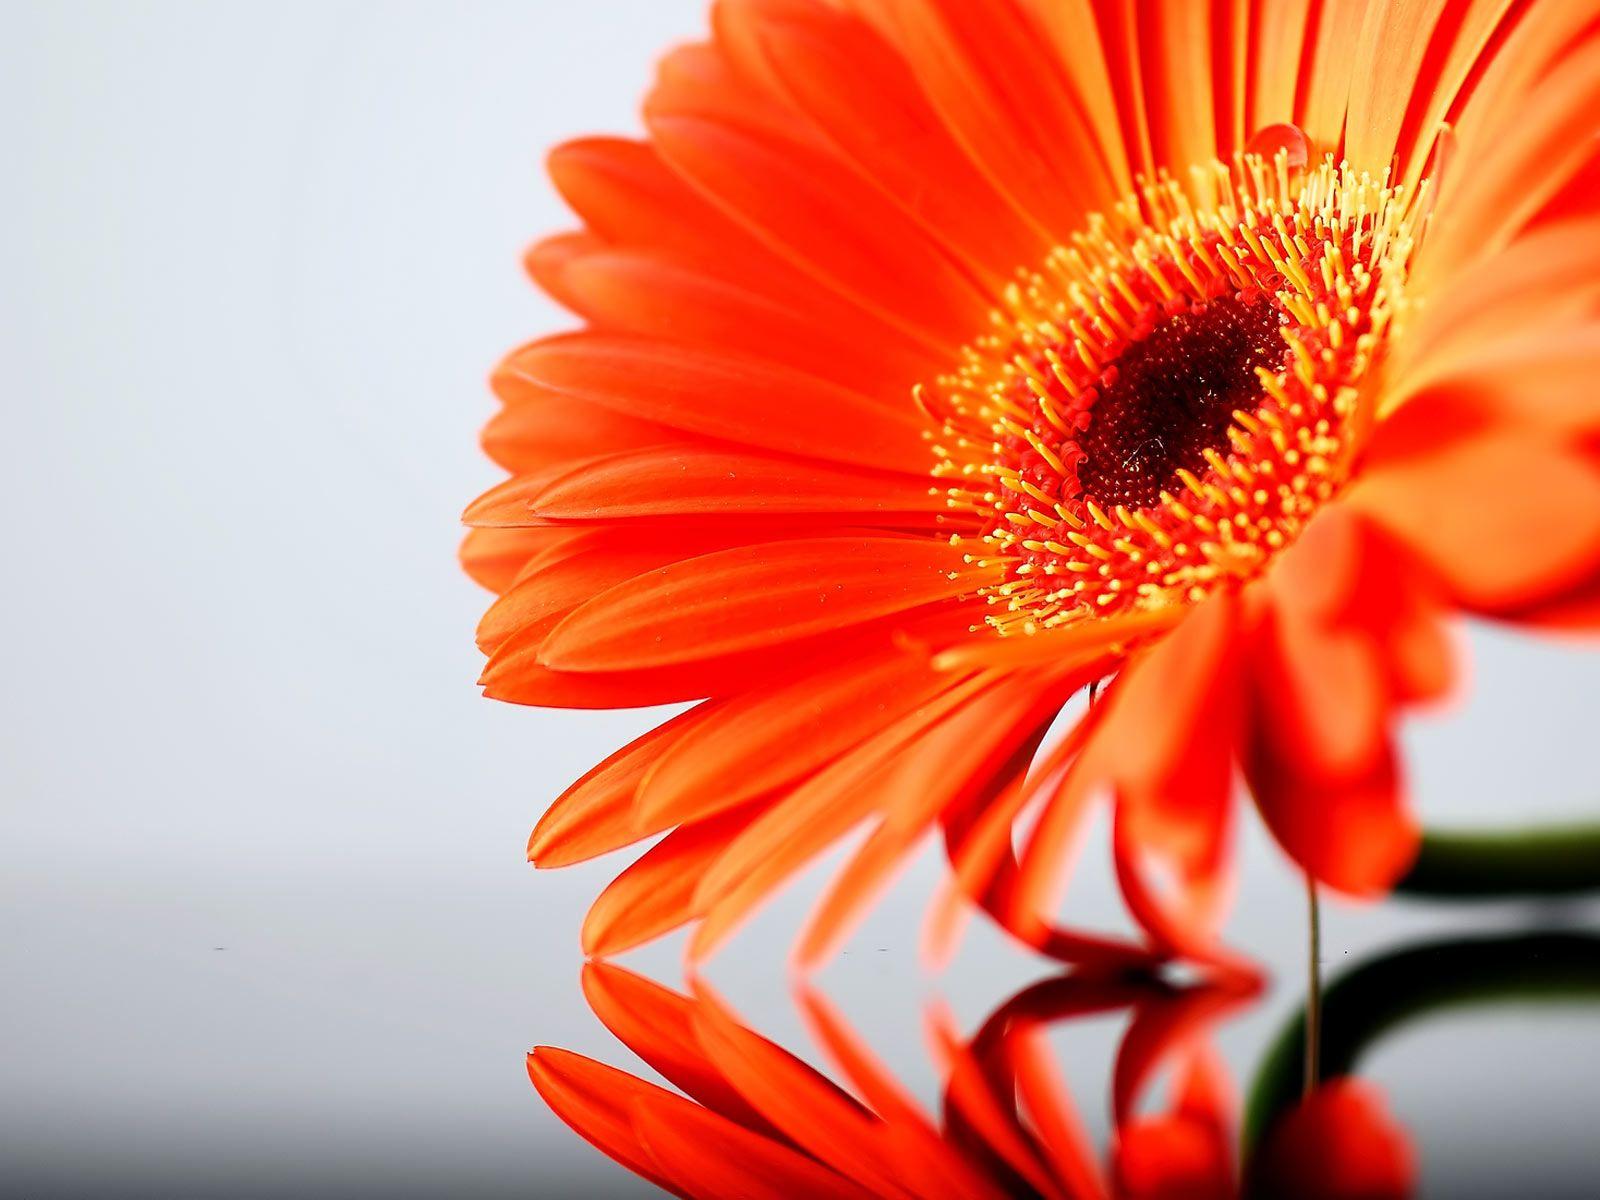 Desktop Wallpaper Gallery Nature Orange Gerbera Daisy Flower Gerbera Flower Gerbera Daisy Orange Flowers